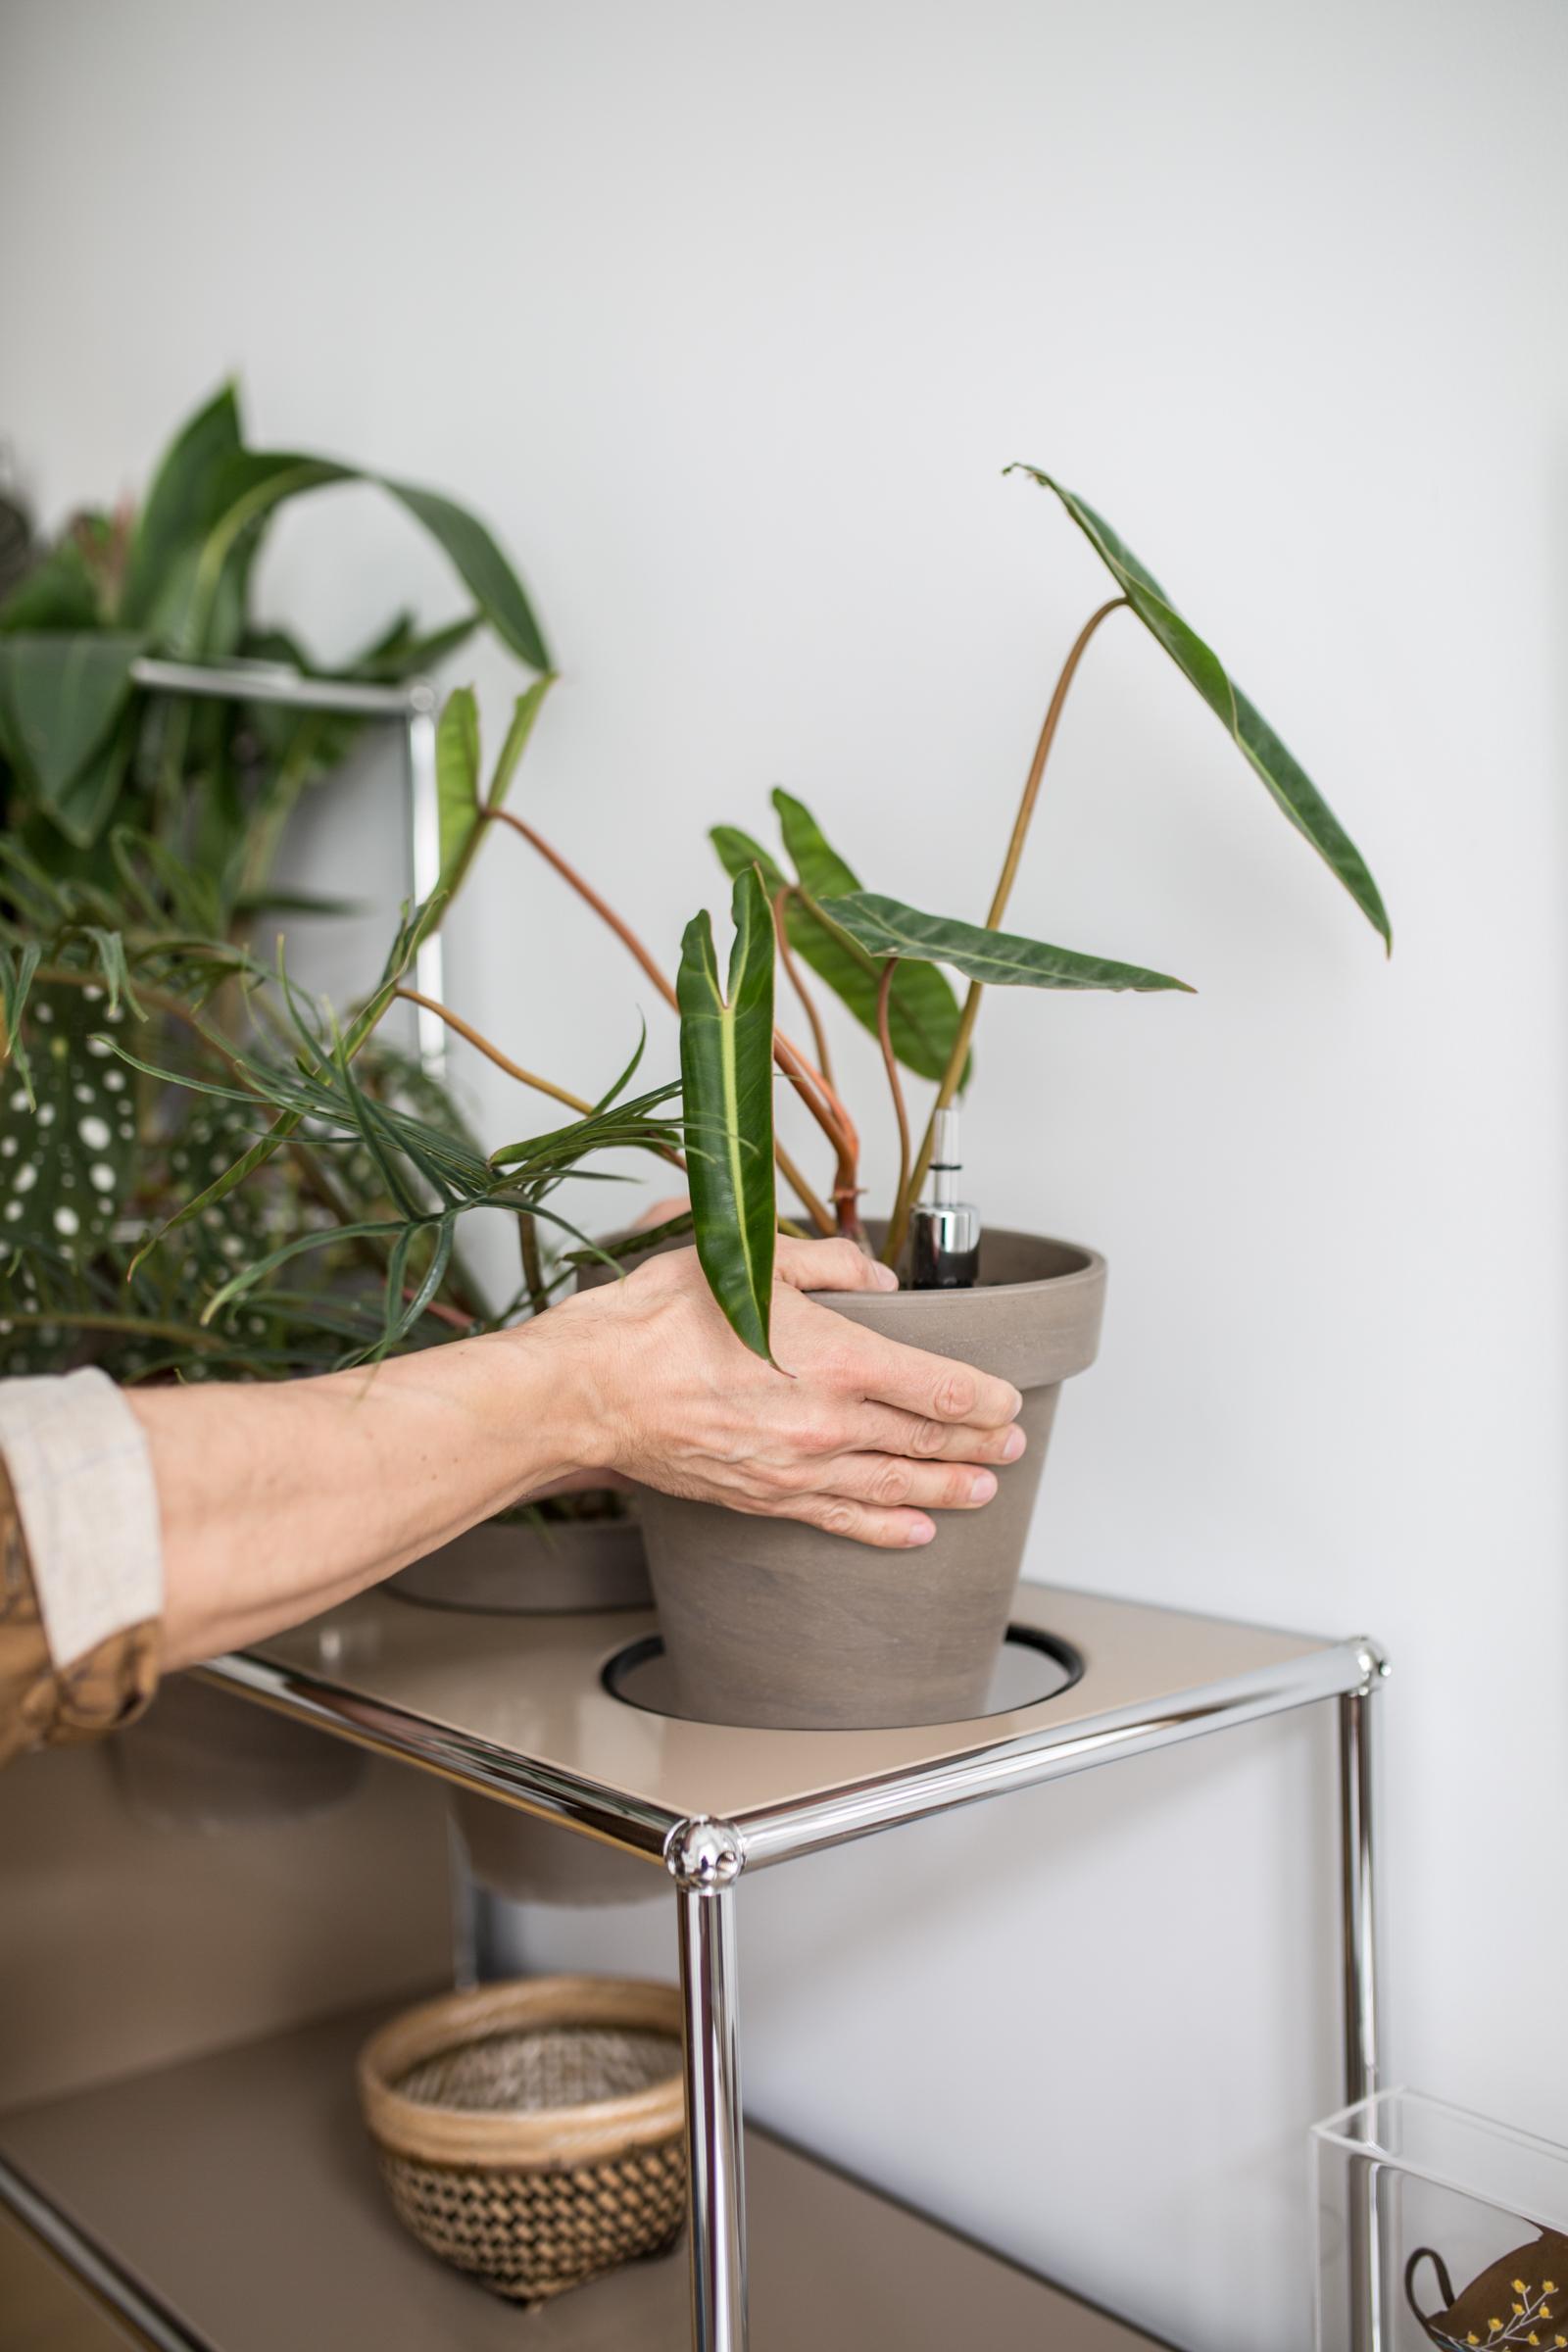 USM Haller, World of Plants, Home Story, Berlin, plant shelves